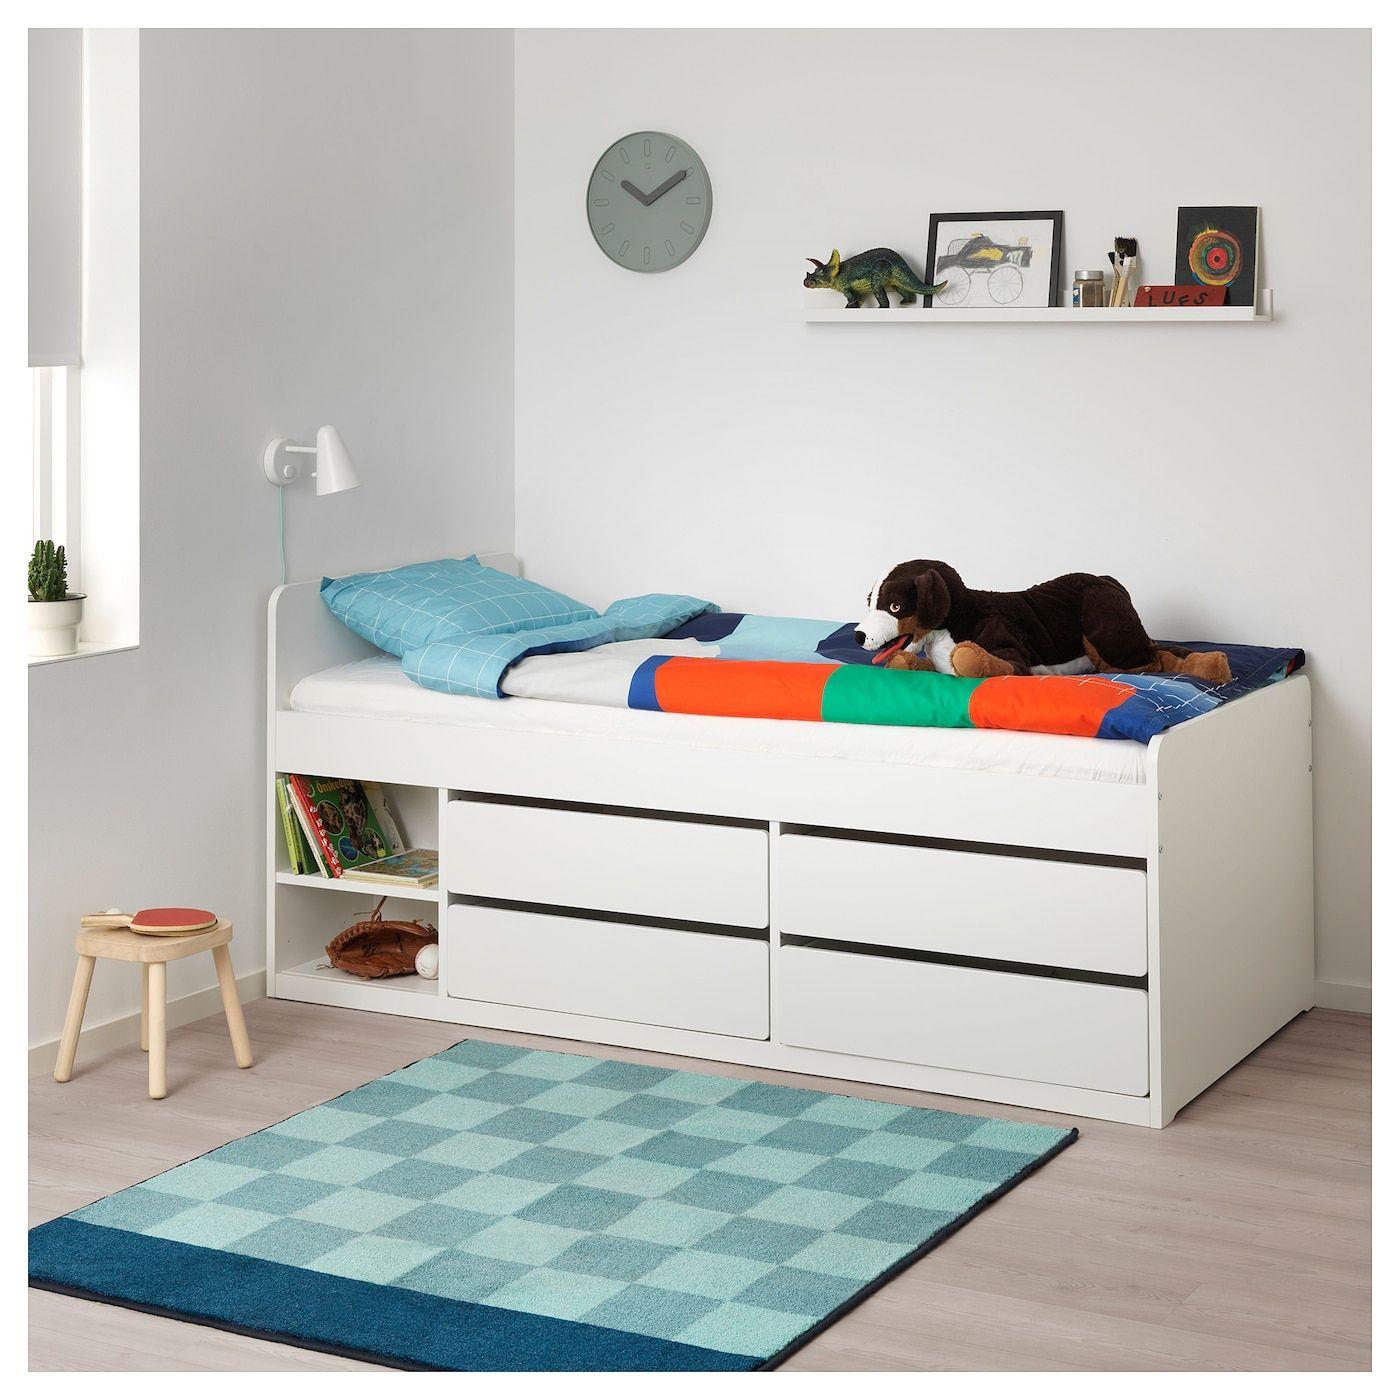 Slakt Bed Frame W Storage Slatted Bedbase White Twin Bedframe